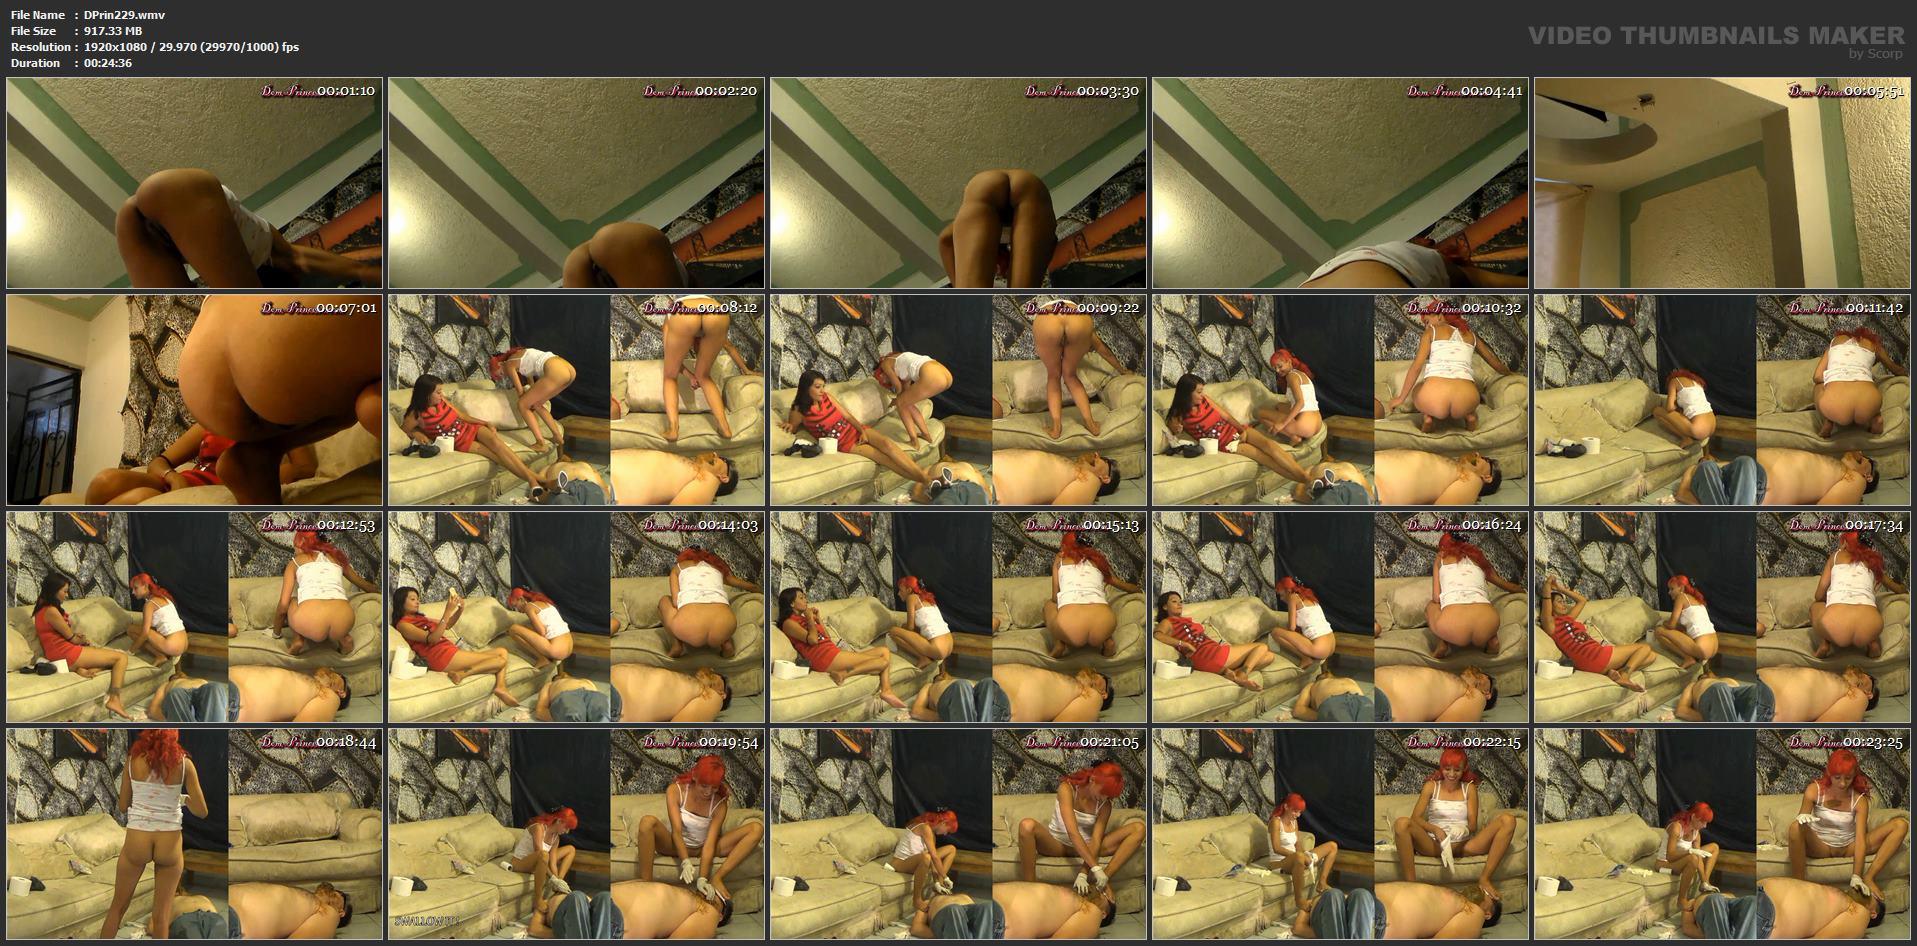 [DOM-PRINCESS] Toiet Slave has Surprised Visit Part 2 Inka [FULL HD][1080p][WMV]